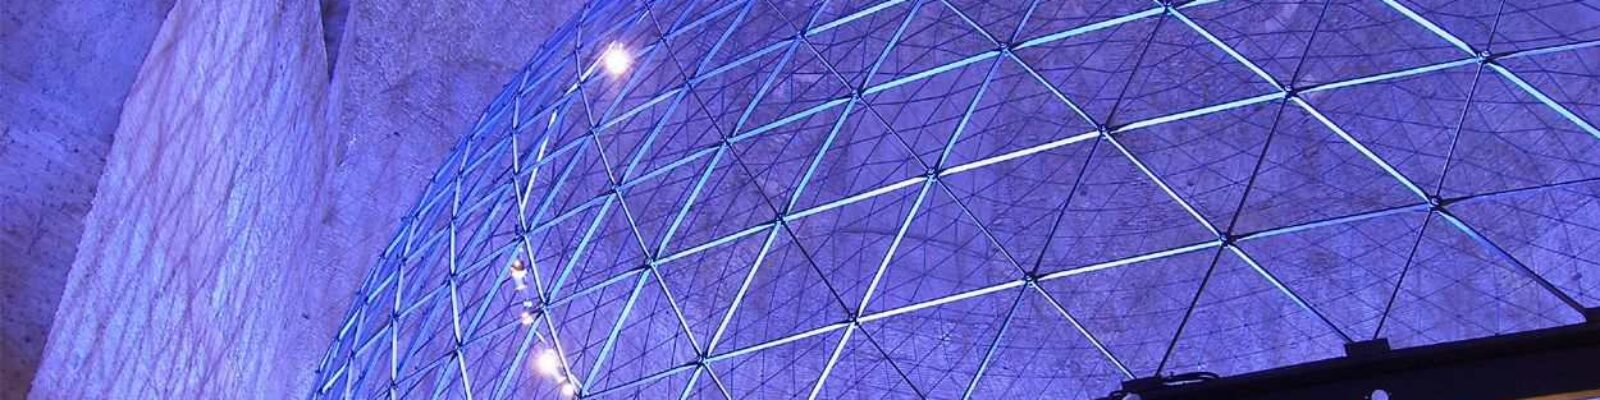 Planetarium Baths of Diocletian dettaglio struttura dei corpi illuminanti - Design Luce